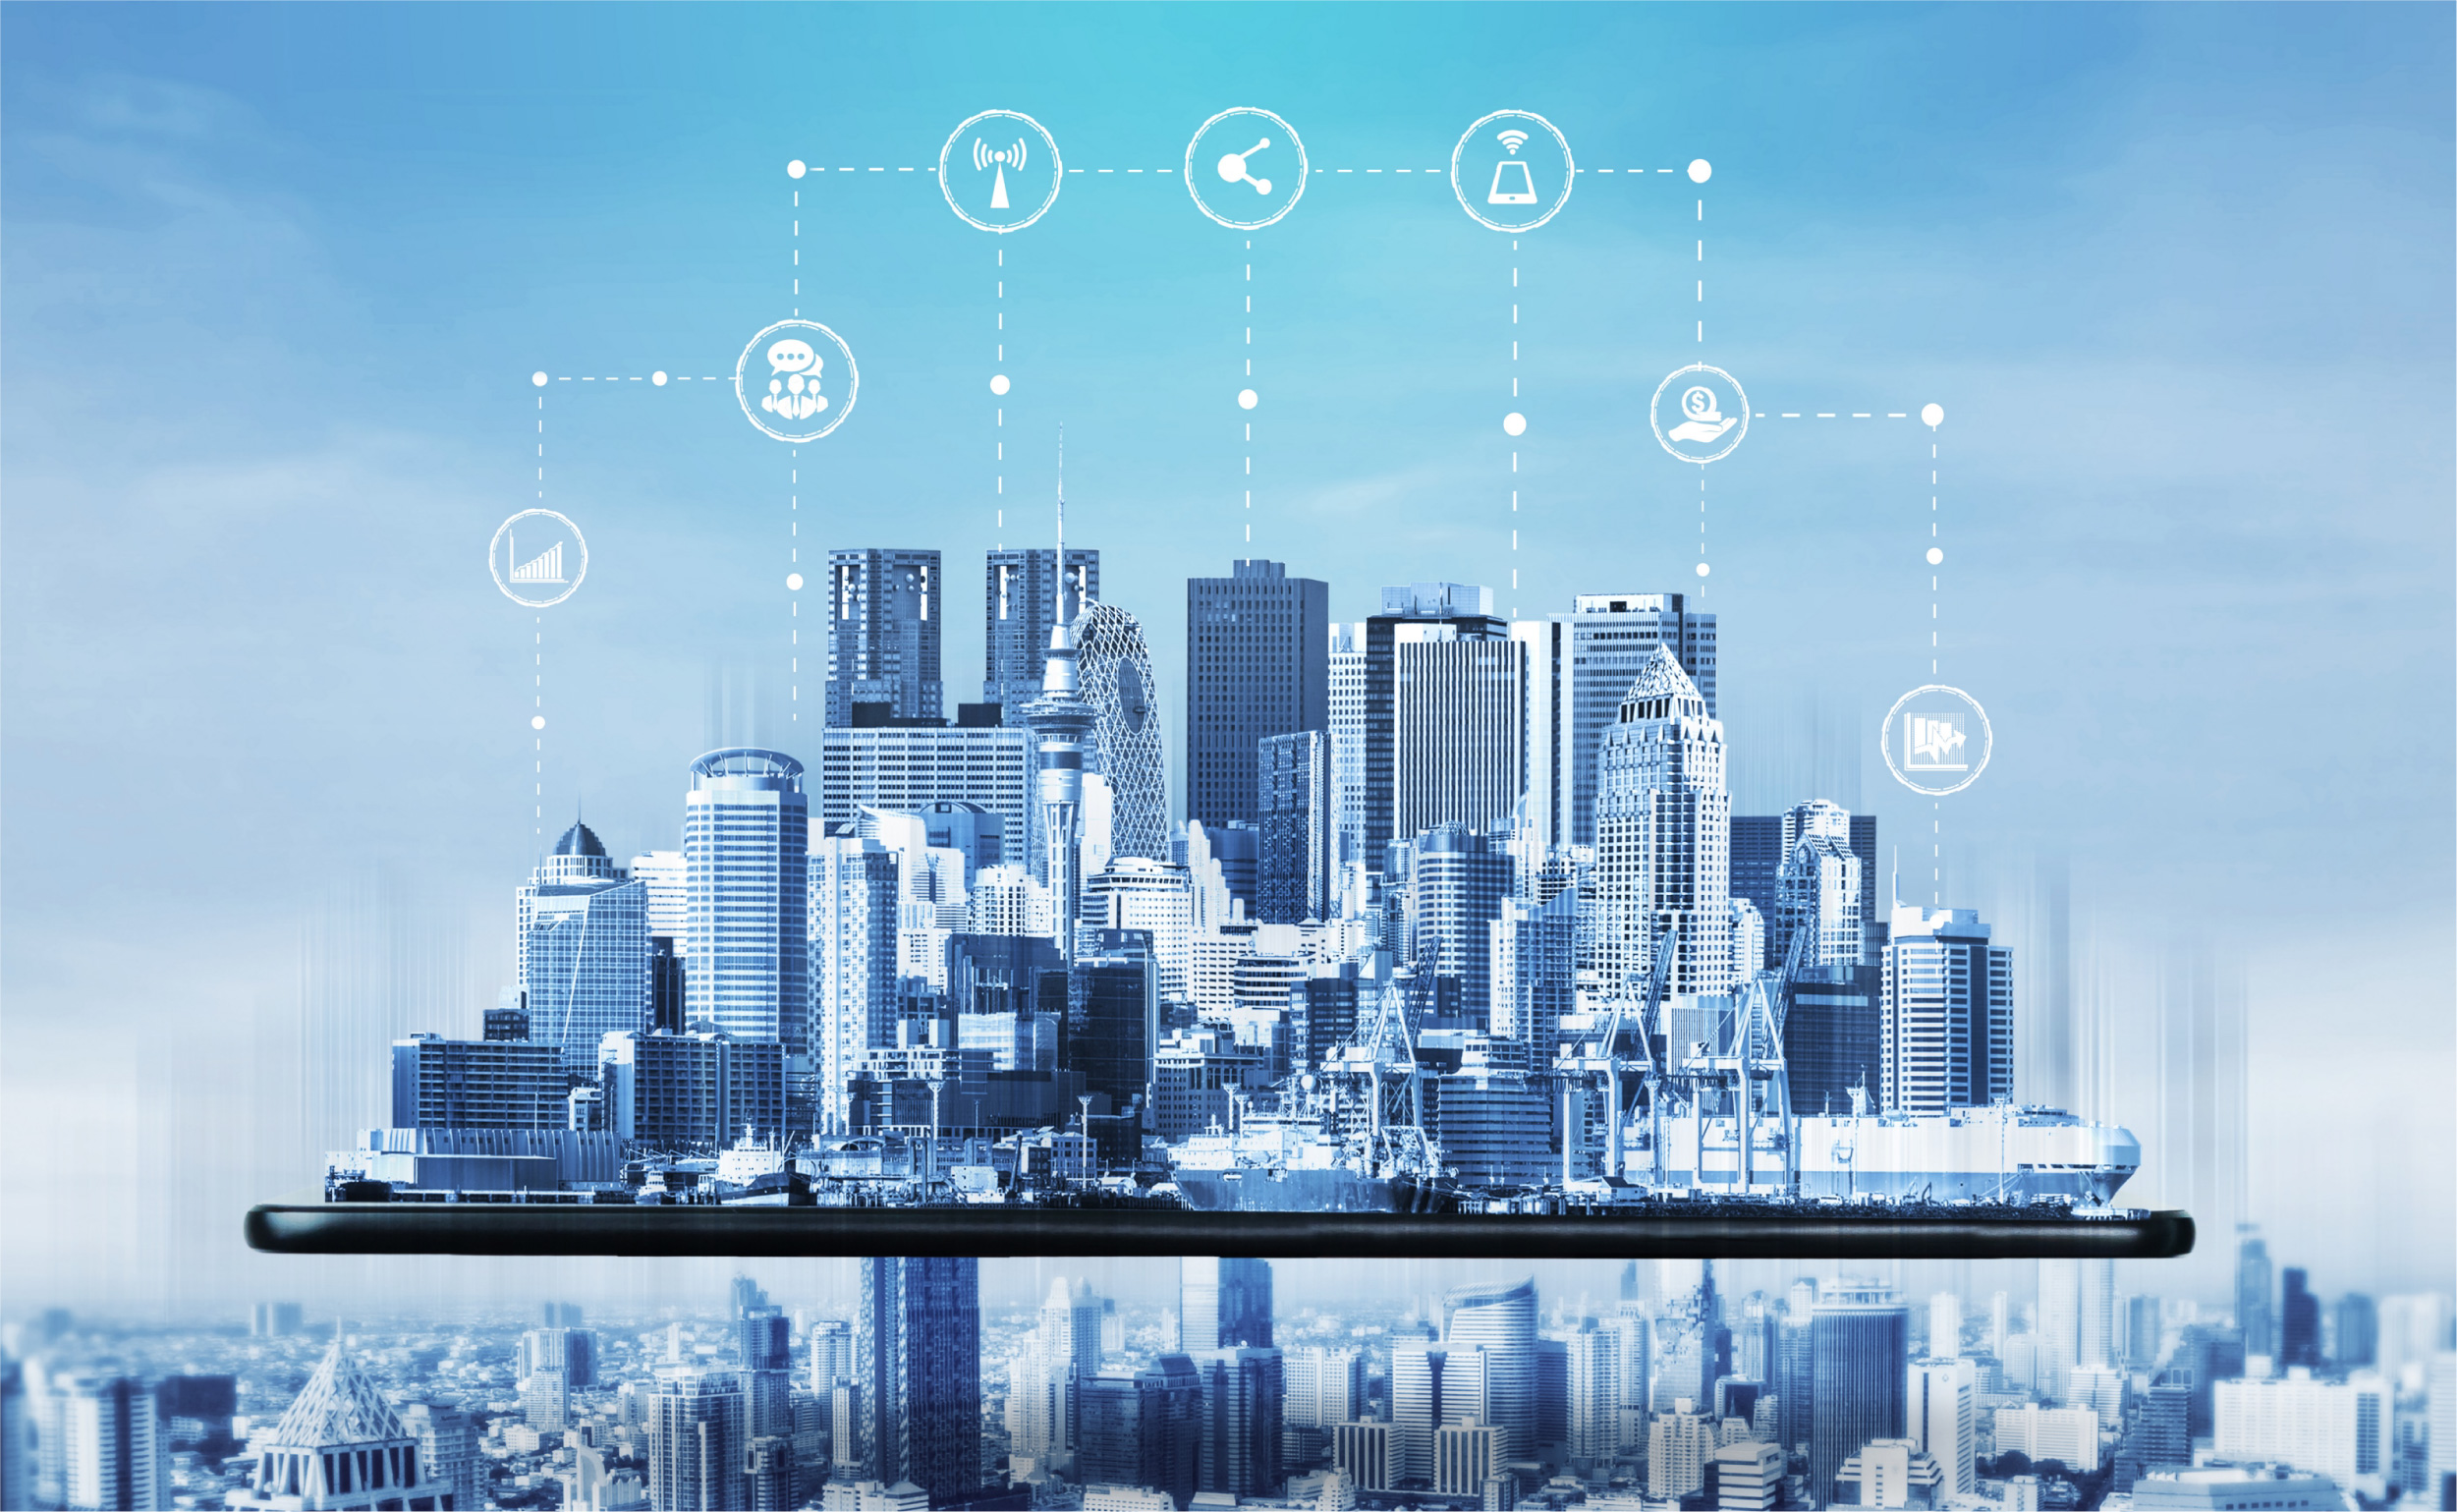 modern-creative-communication-internet-network-connect-smart-city | Botkeeper